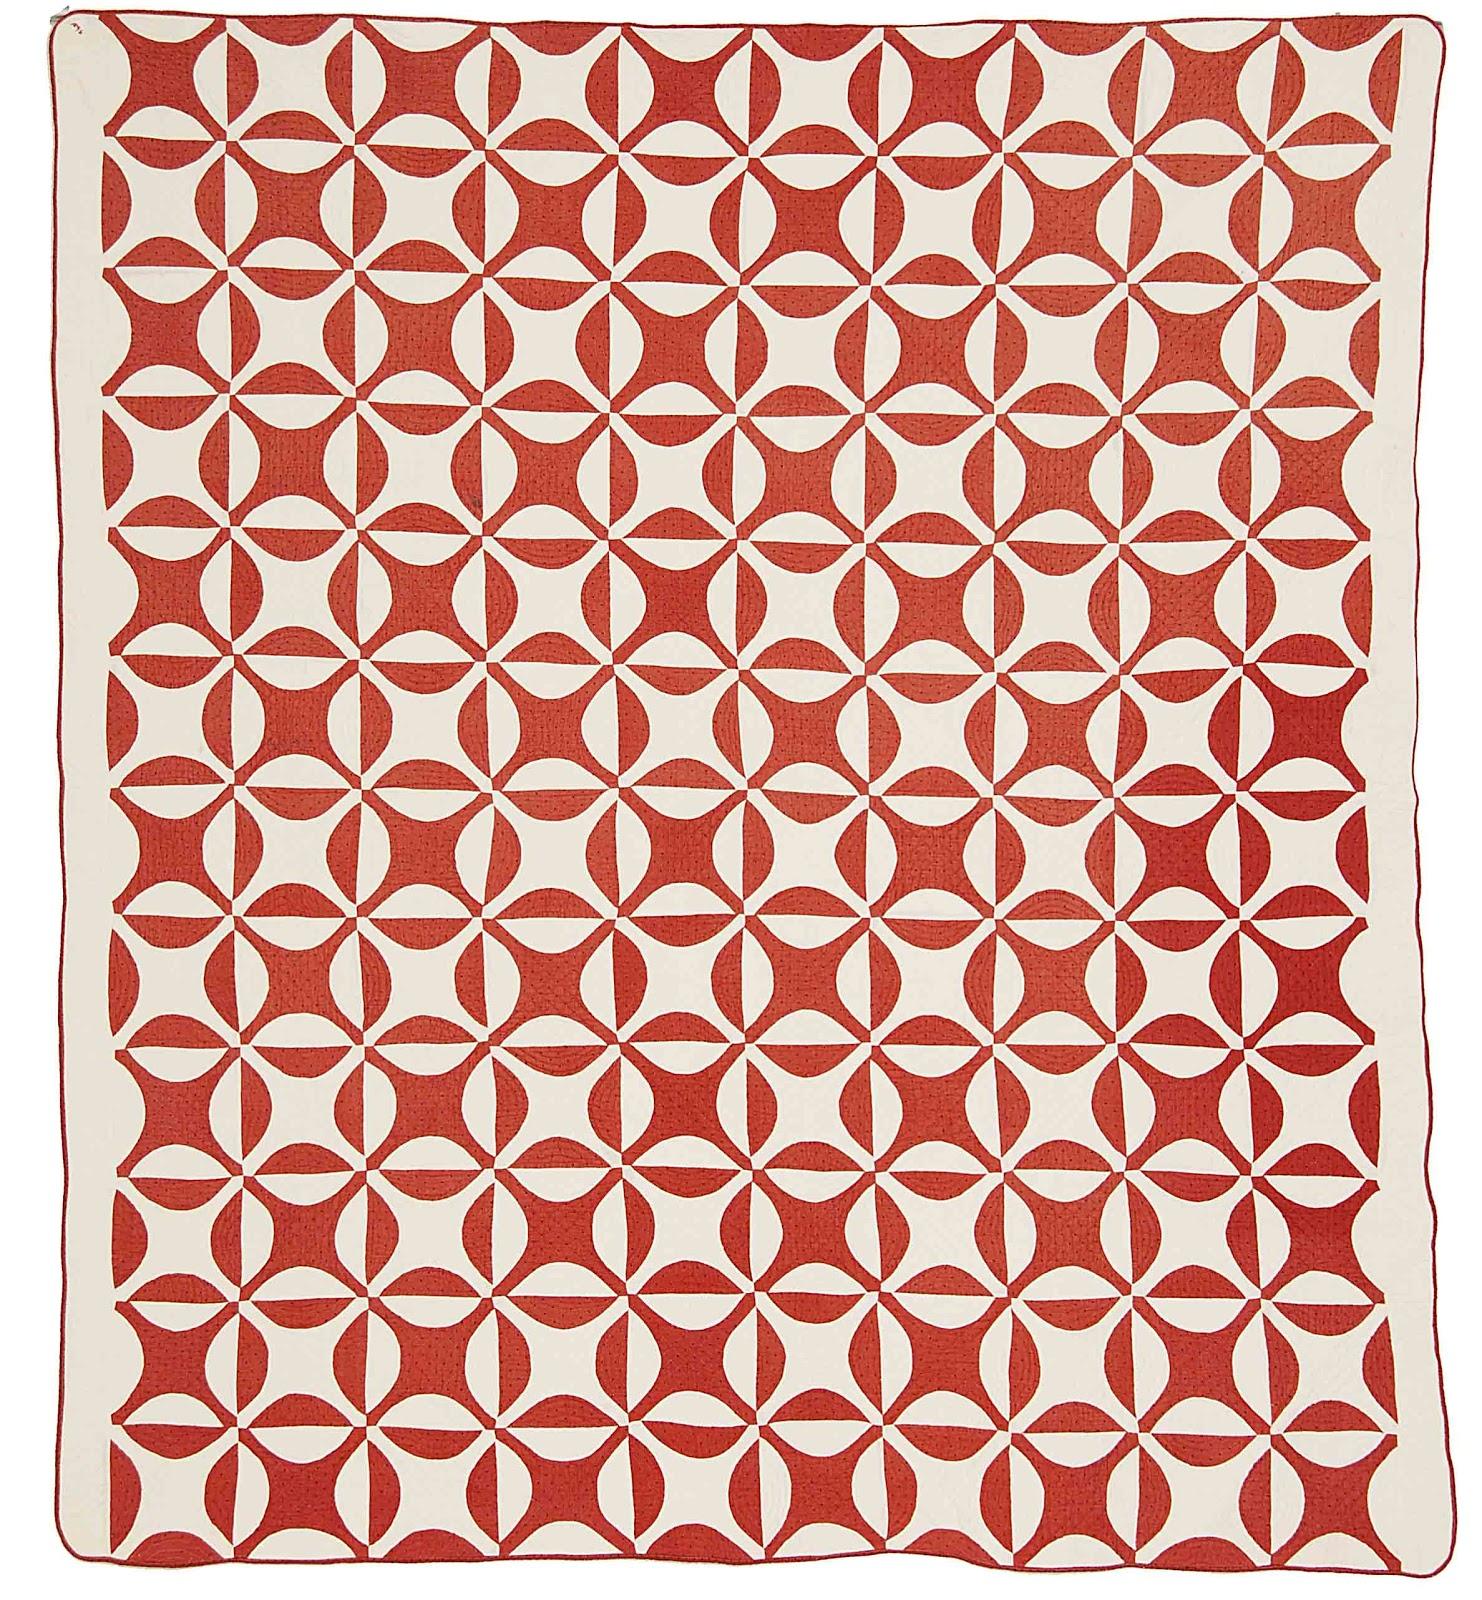 RMQM's Inspiration Quilts